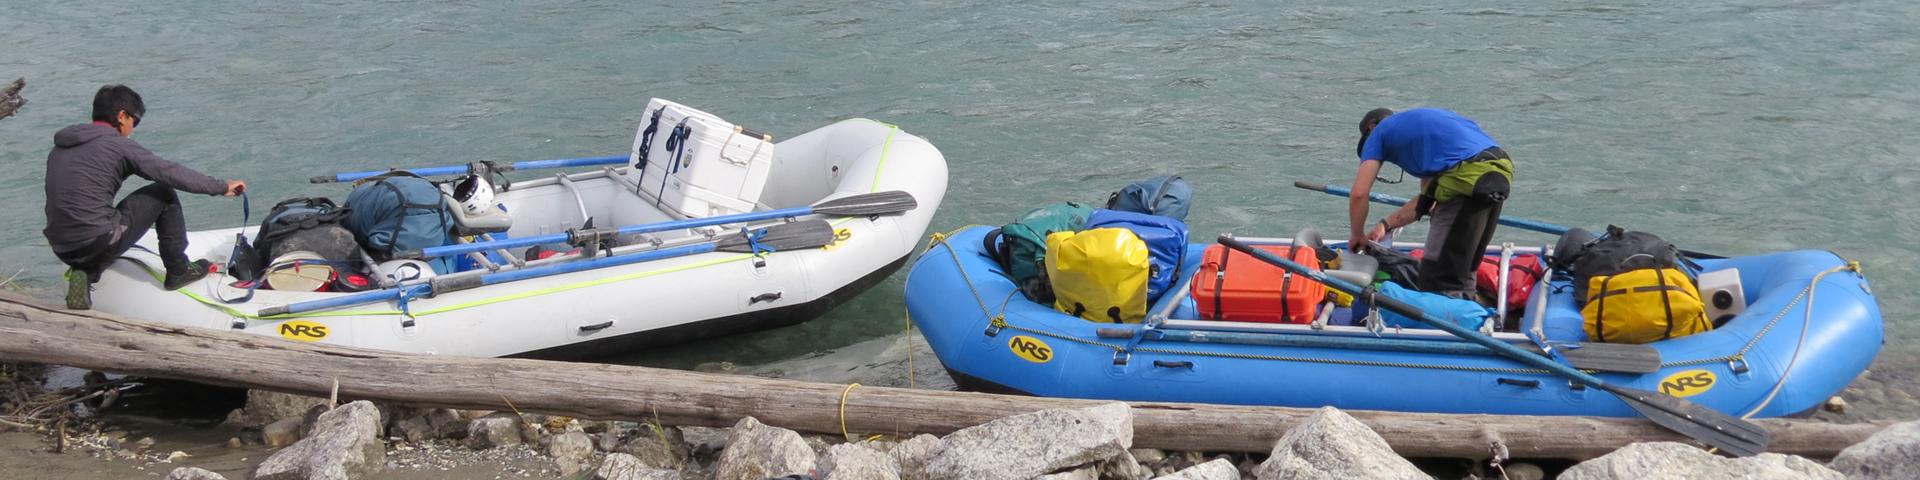 KOOTENAY RIVER RAFT SUPPORTED KAYAK TRIP by Aquabatics - Image 408